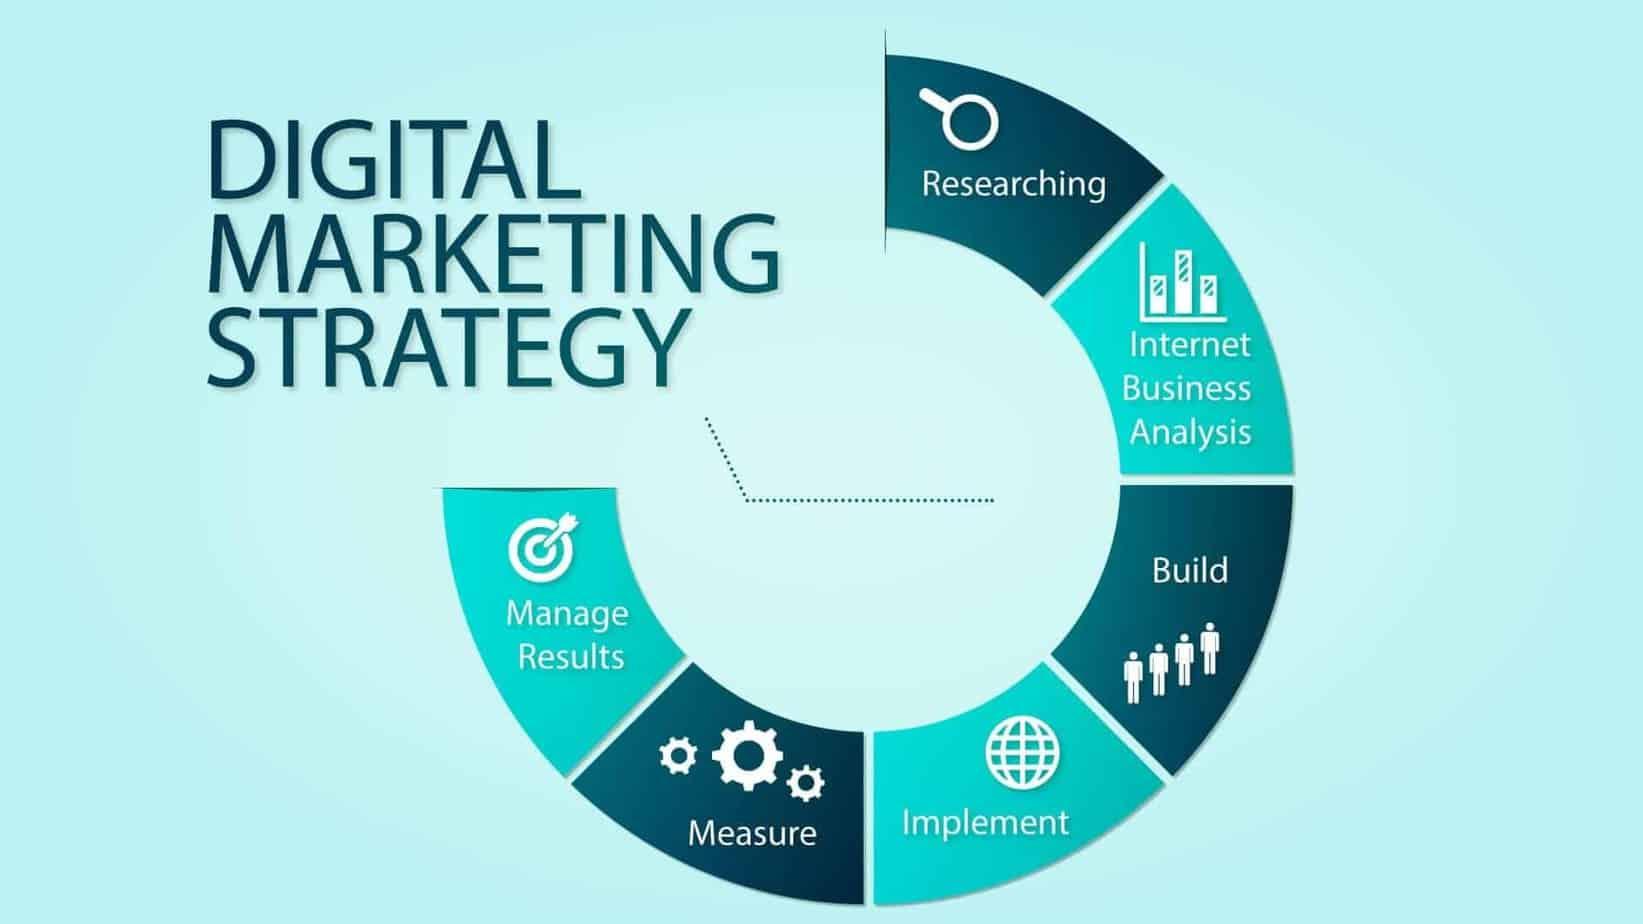 Create Digital Marketing Strategy 2019